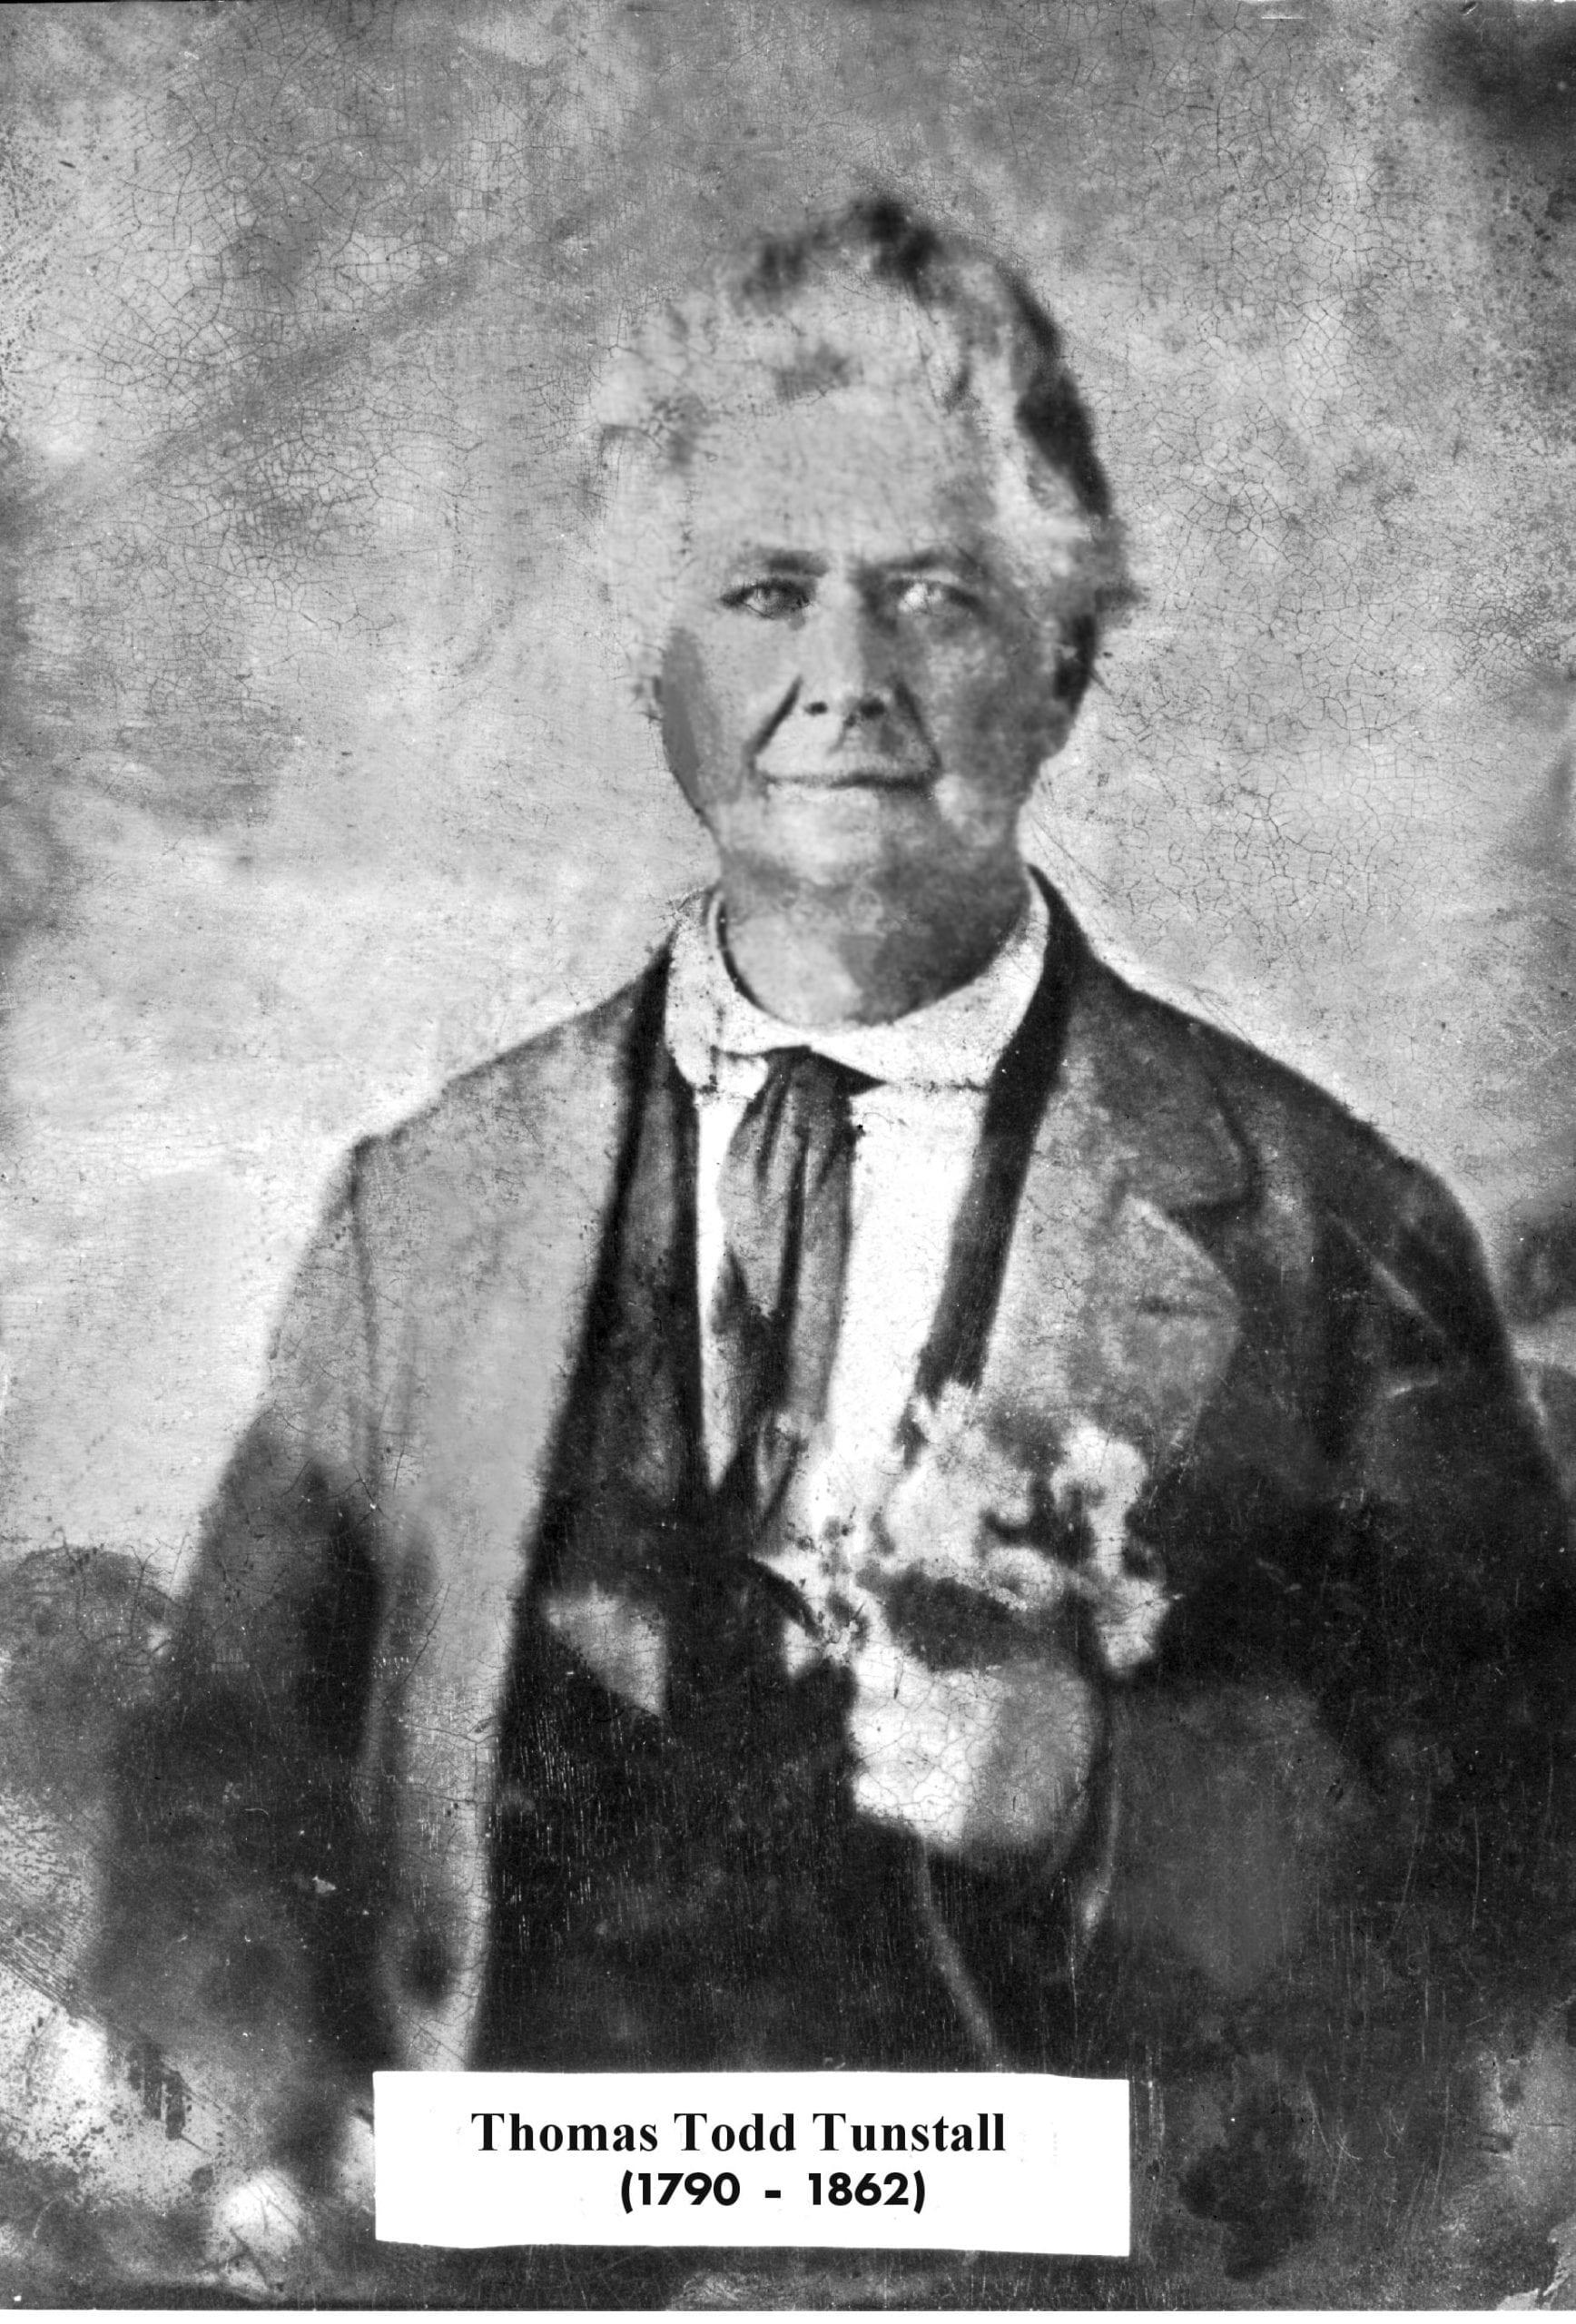 1850's – Thomas Todd Tunstall